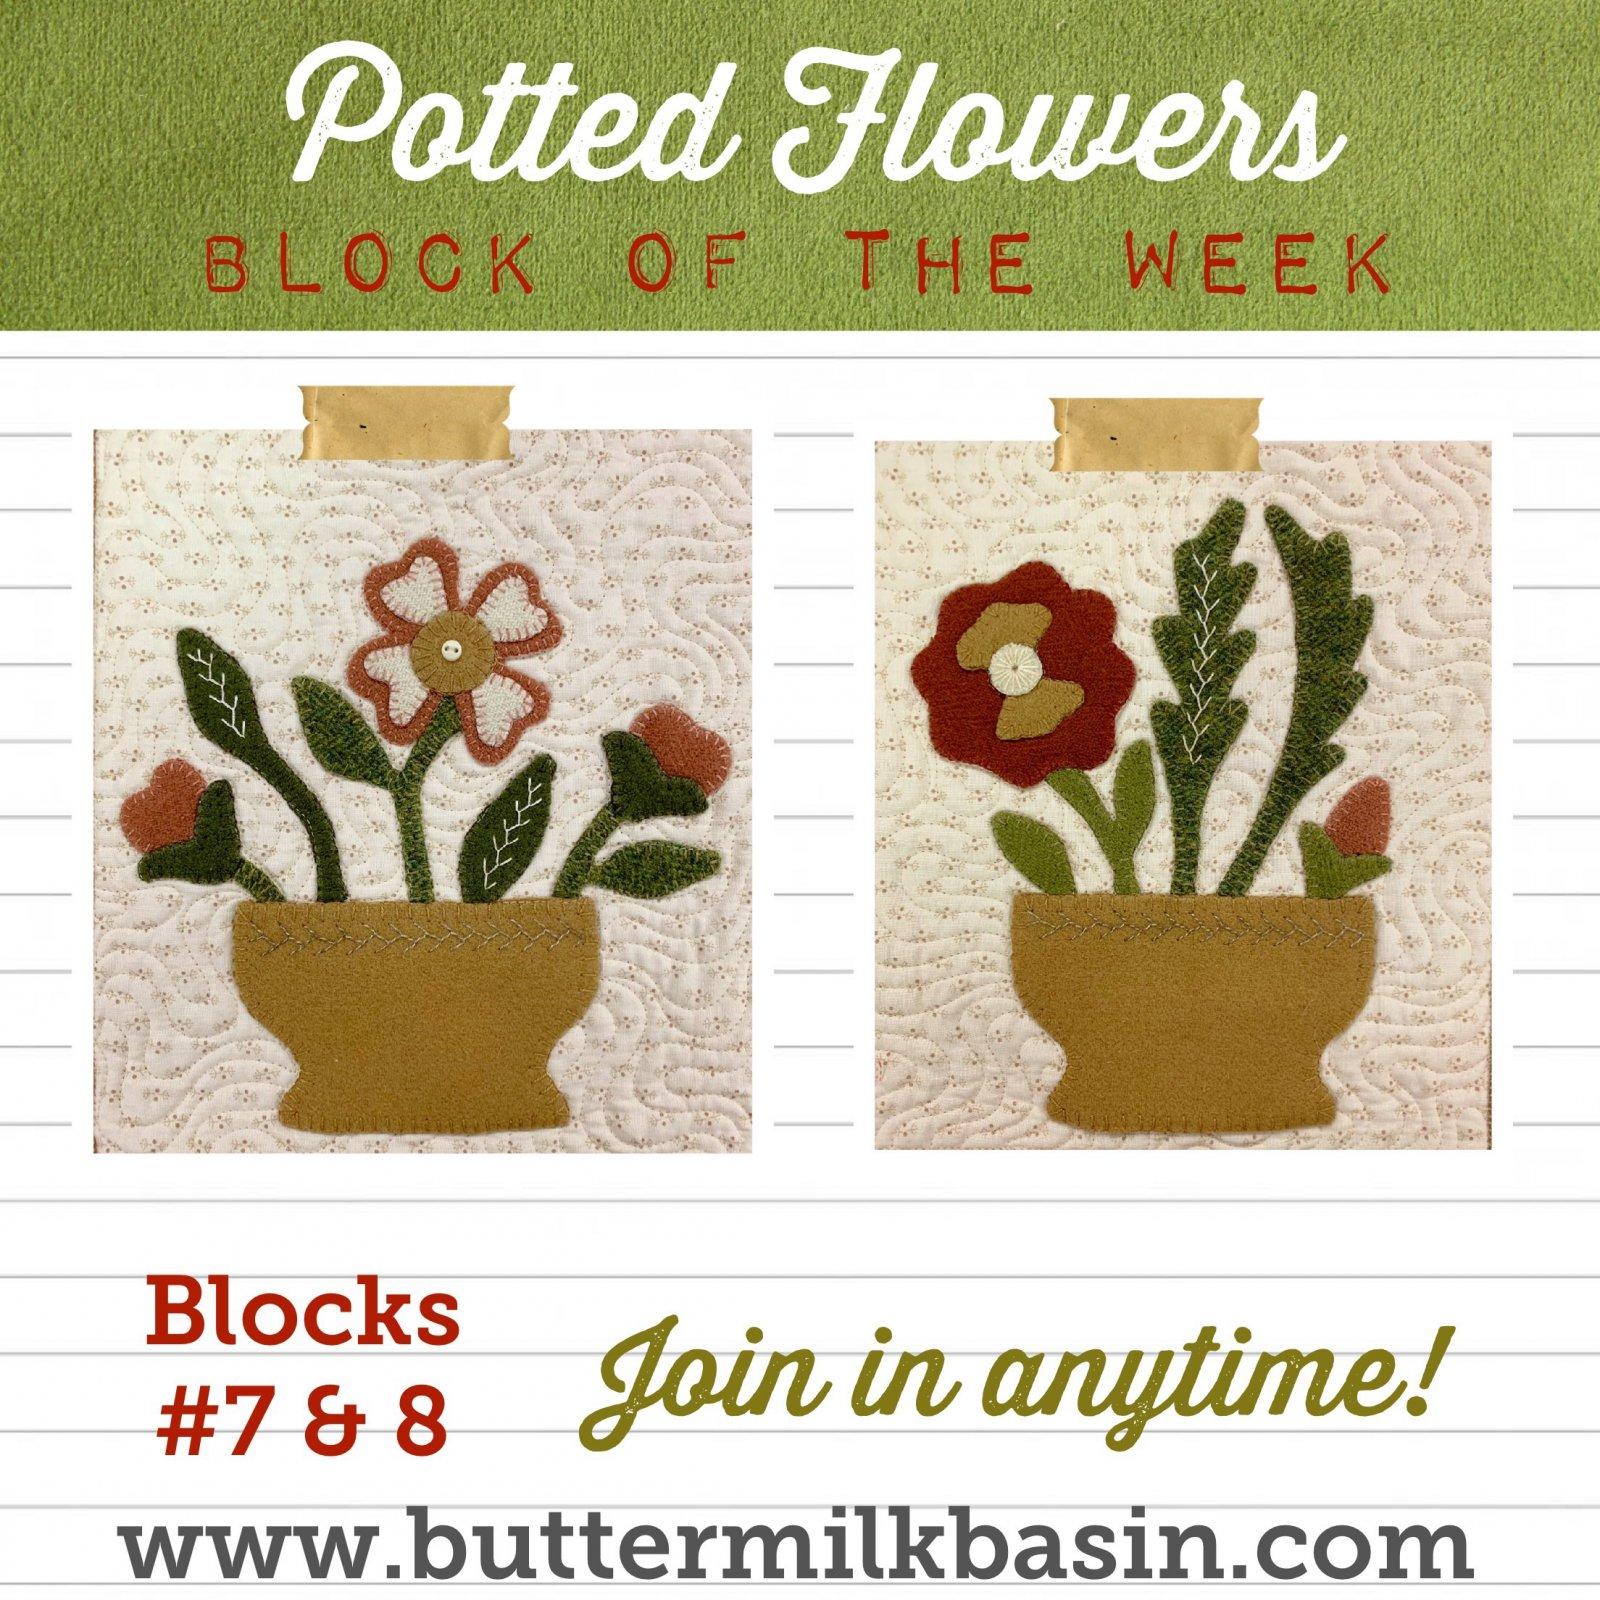 Vintage Potted Flowers Quilt Block of the Week *Blocks 7 & 8 Pattern & Kit